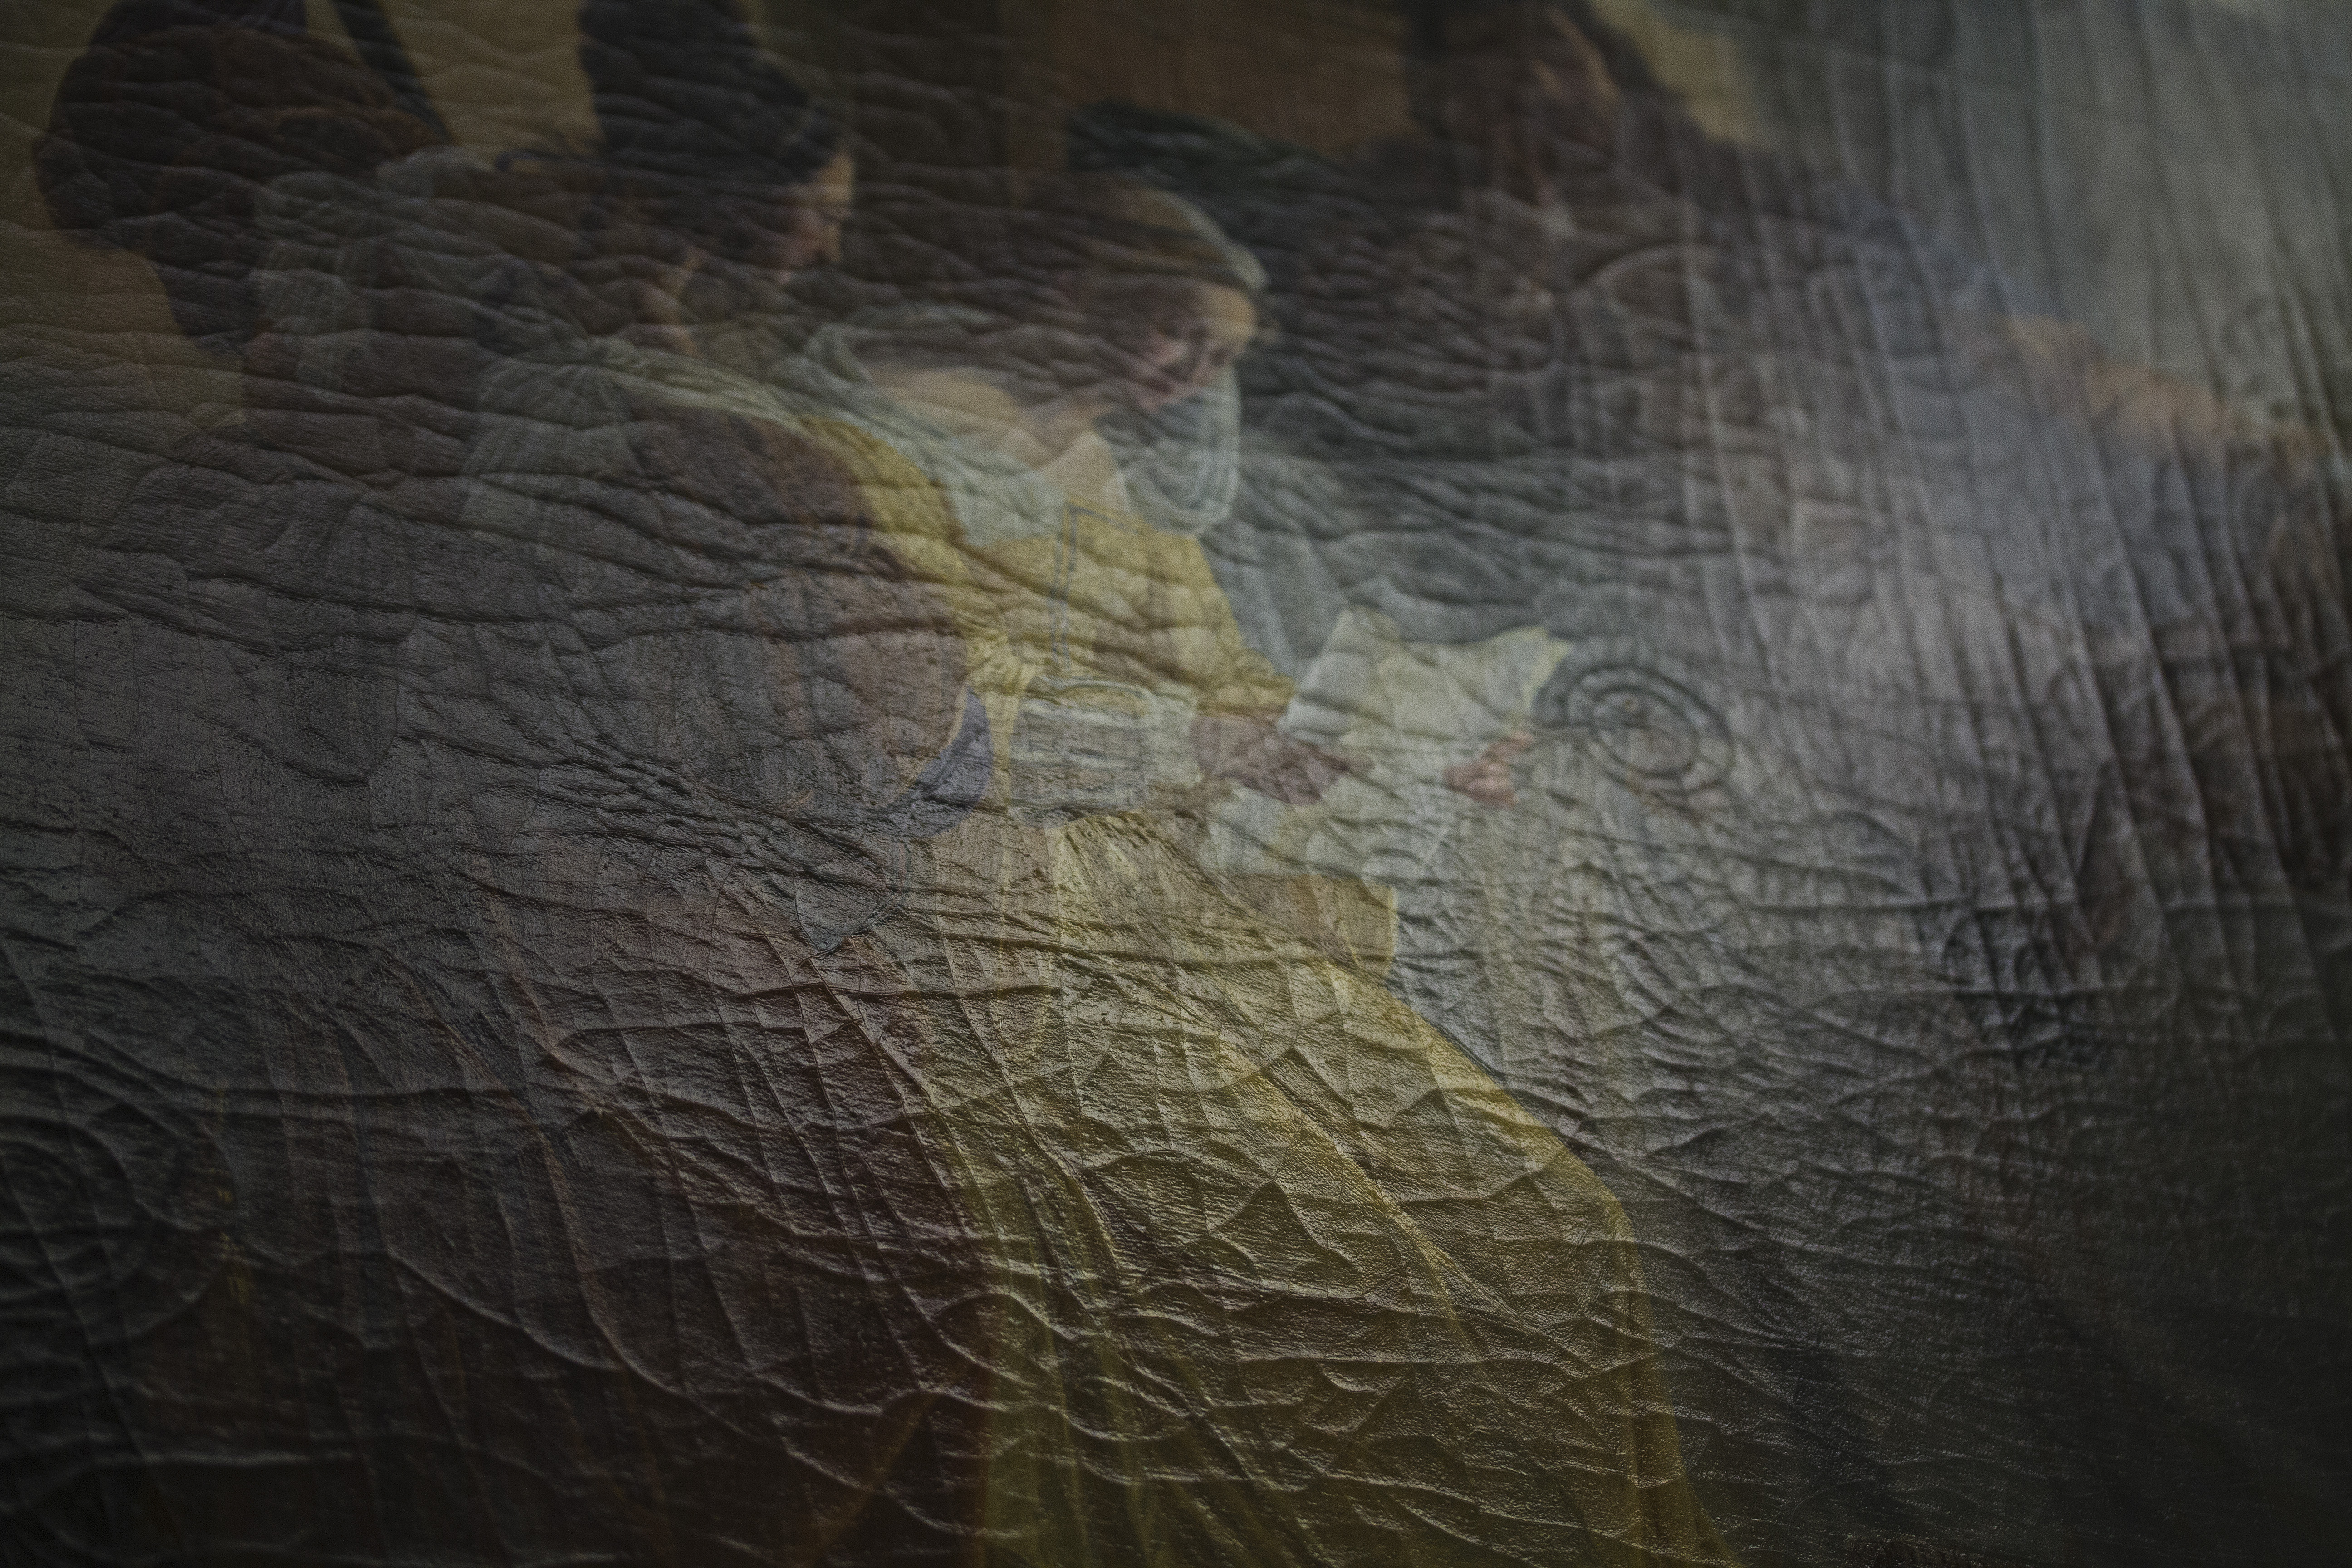 2_Louvre_IMG_6405basic raw edit_print_111sharpen